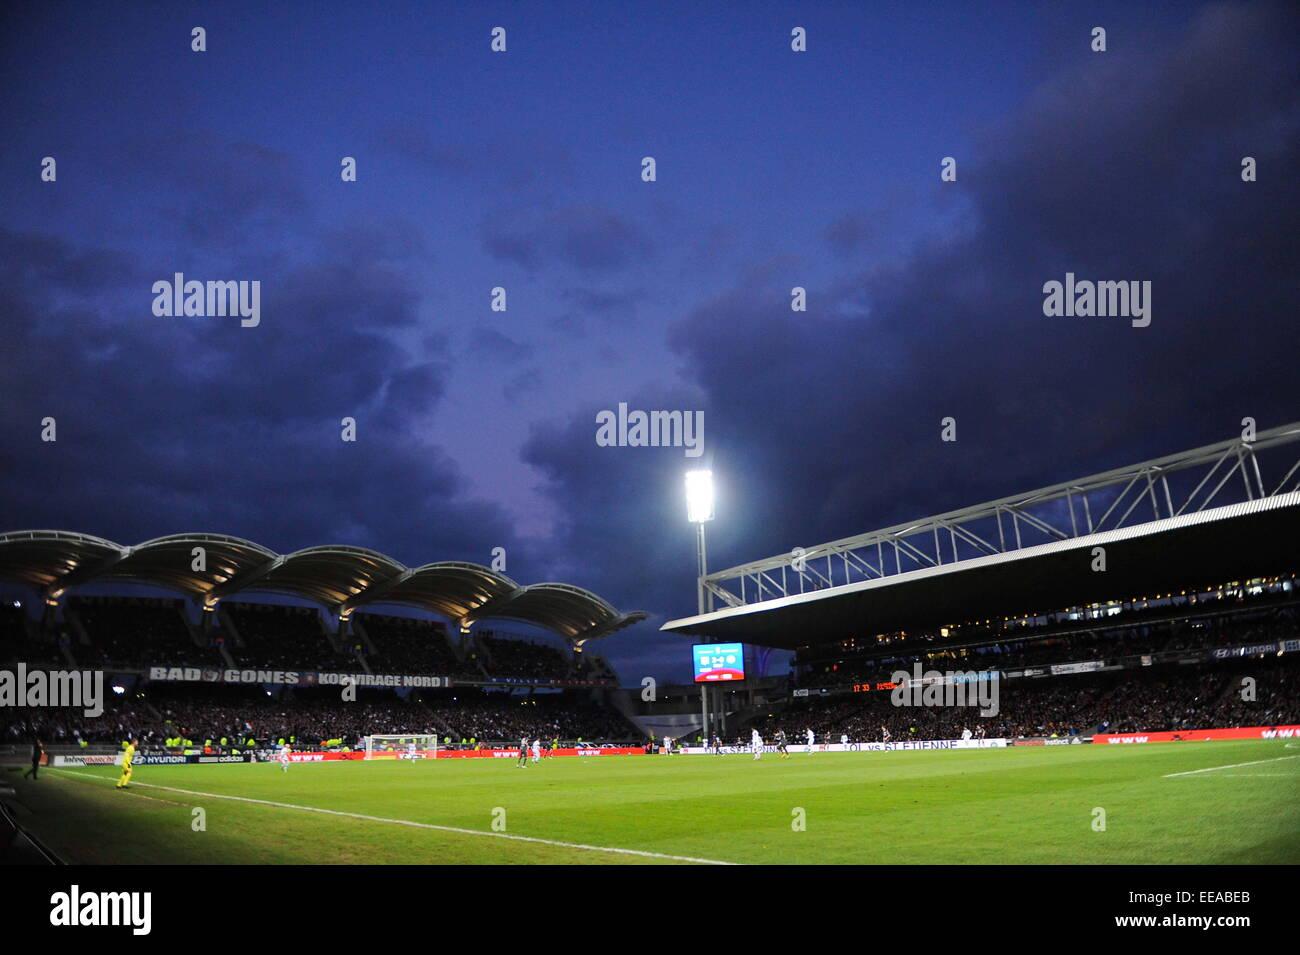 Stade Gerland - 11.01.2015 - Lyon/Toulouse - 20eme journee de Ligue 1.Photo : Jean Paul Thomas/Icon Sport Stock Photo